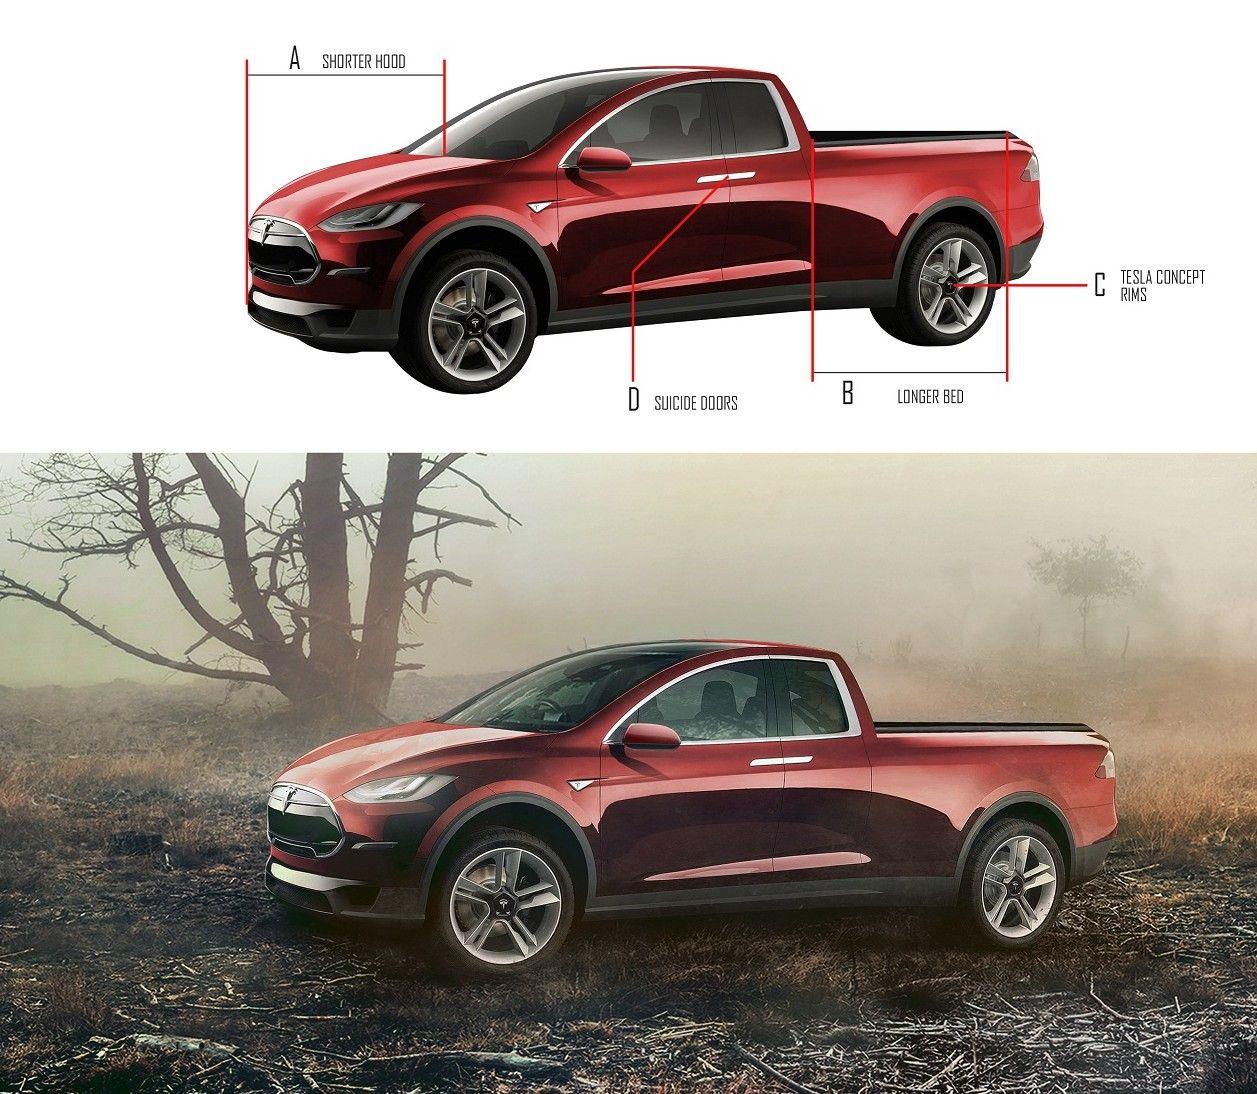 2016 Tesla Pickup Truck Design Sketches Carwow